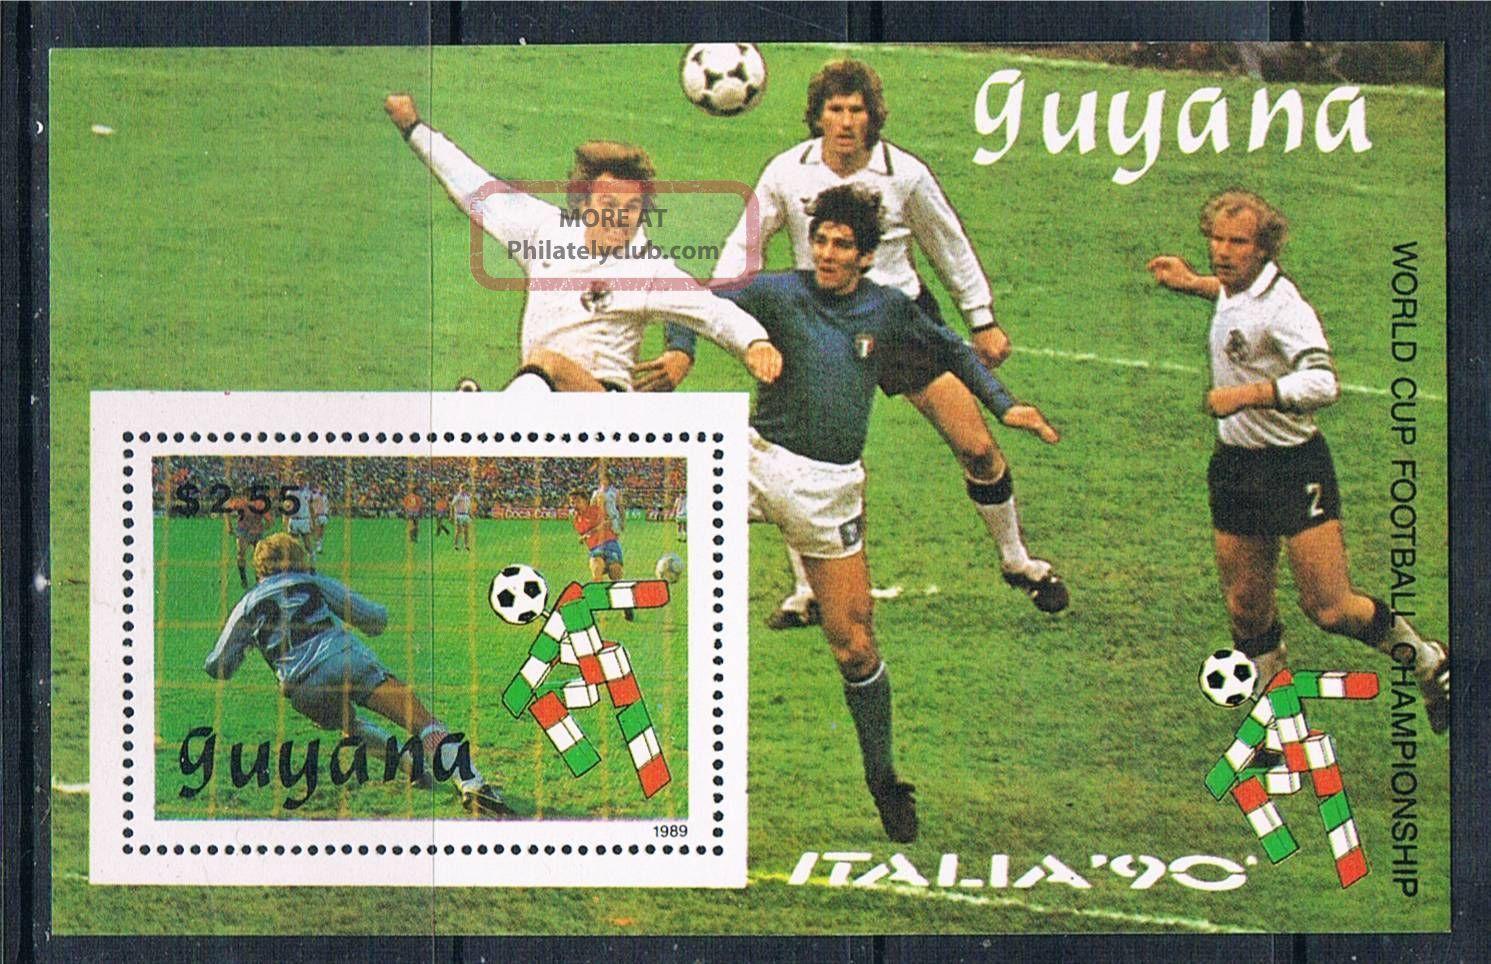 Guyana 1989 World Cup Ms 2222 Latin America photo